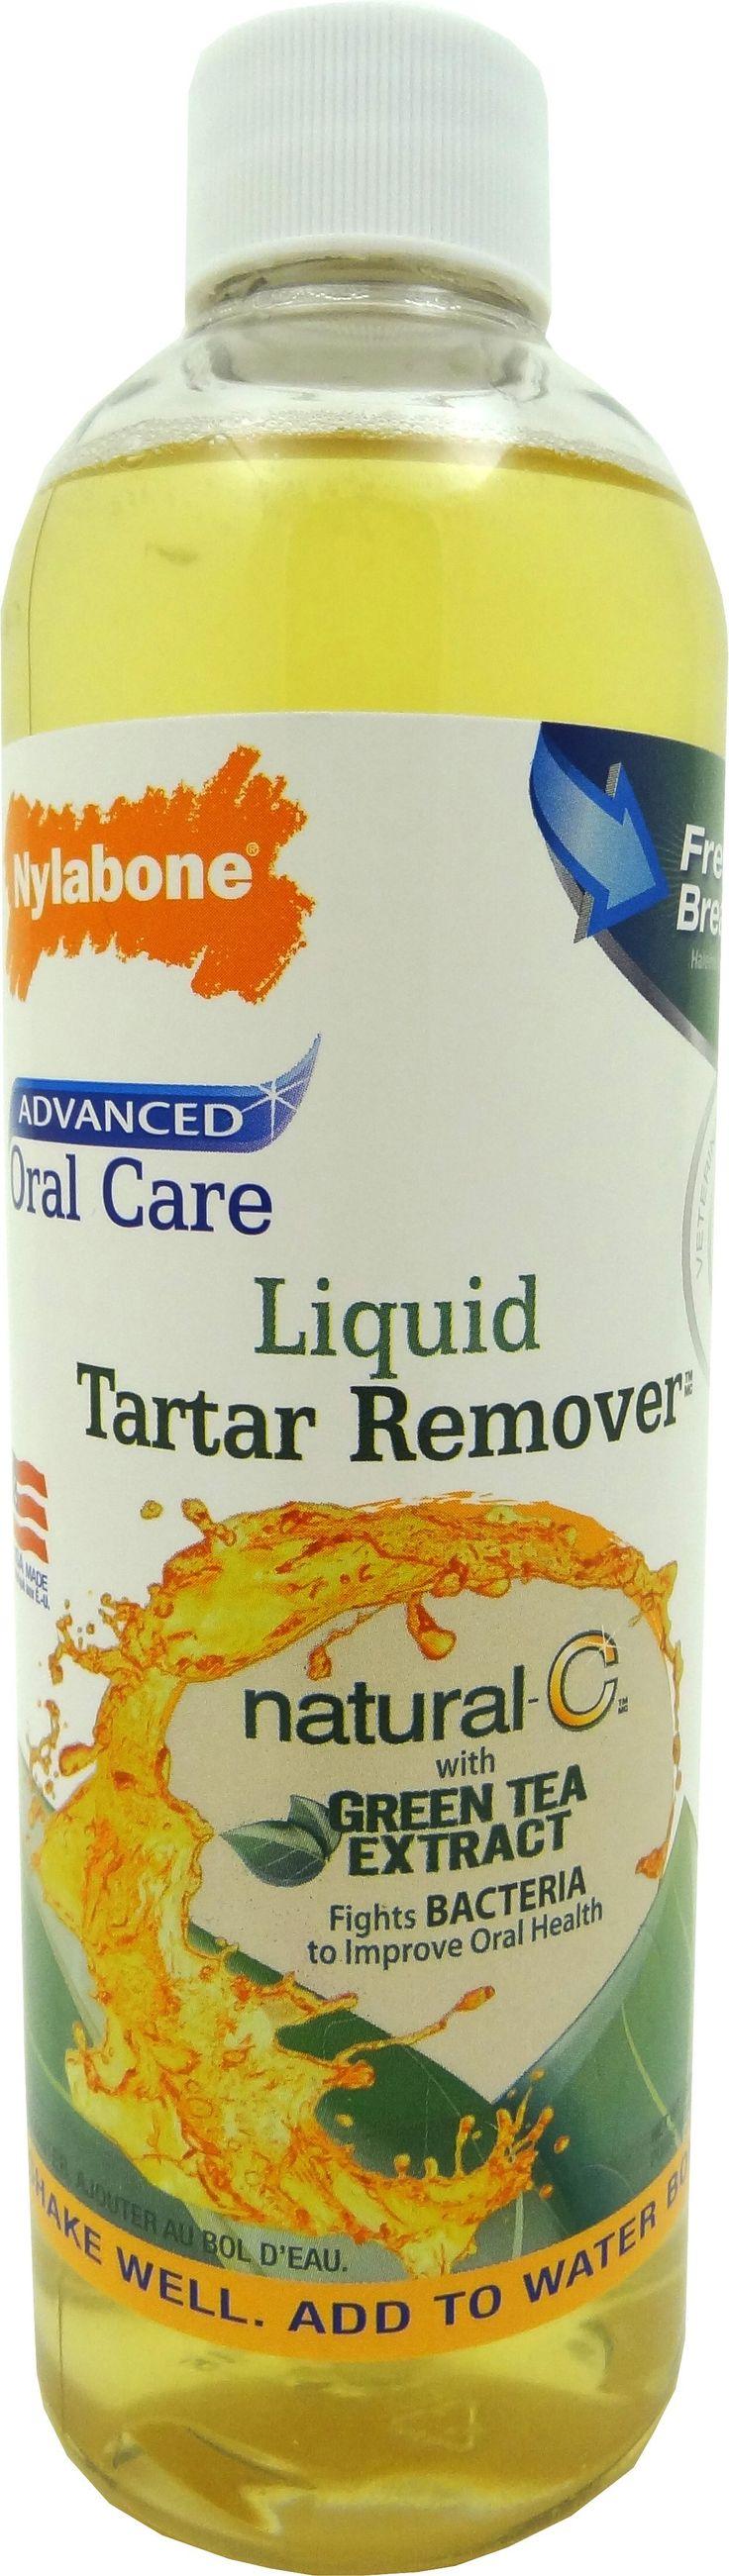 Nylabone Corp (bones) - Advanced Oral Care Natural Liquid Tartar Remover